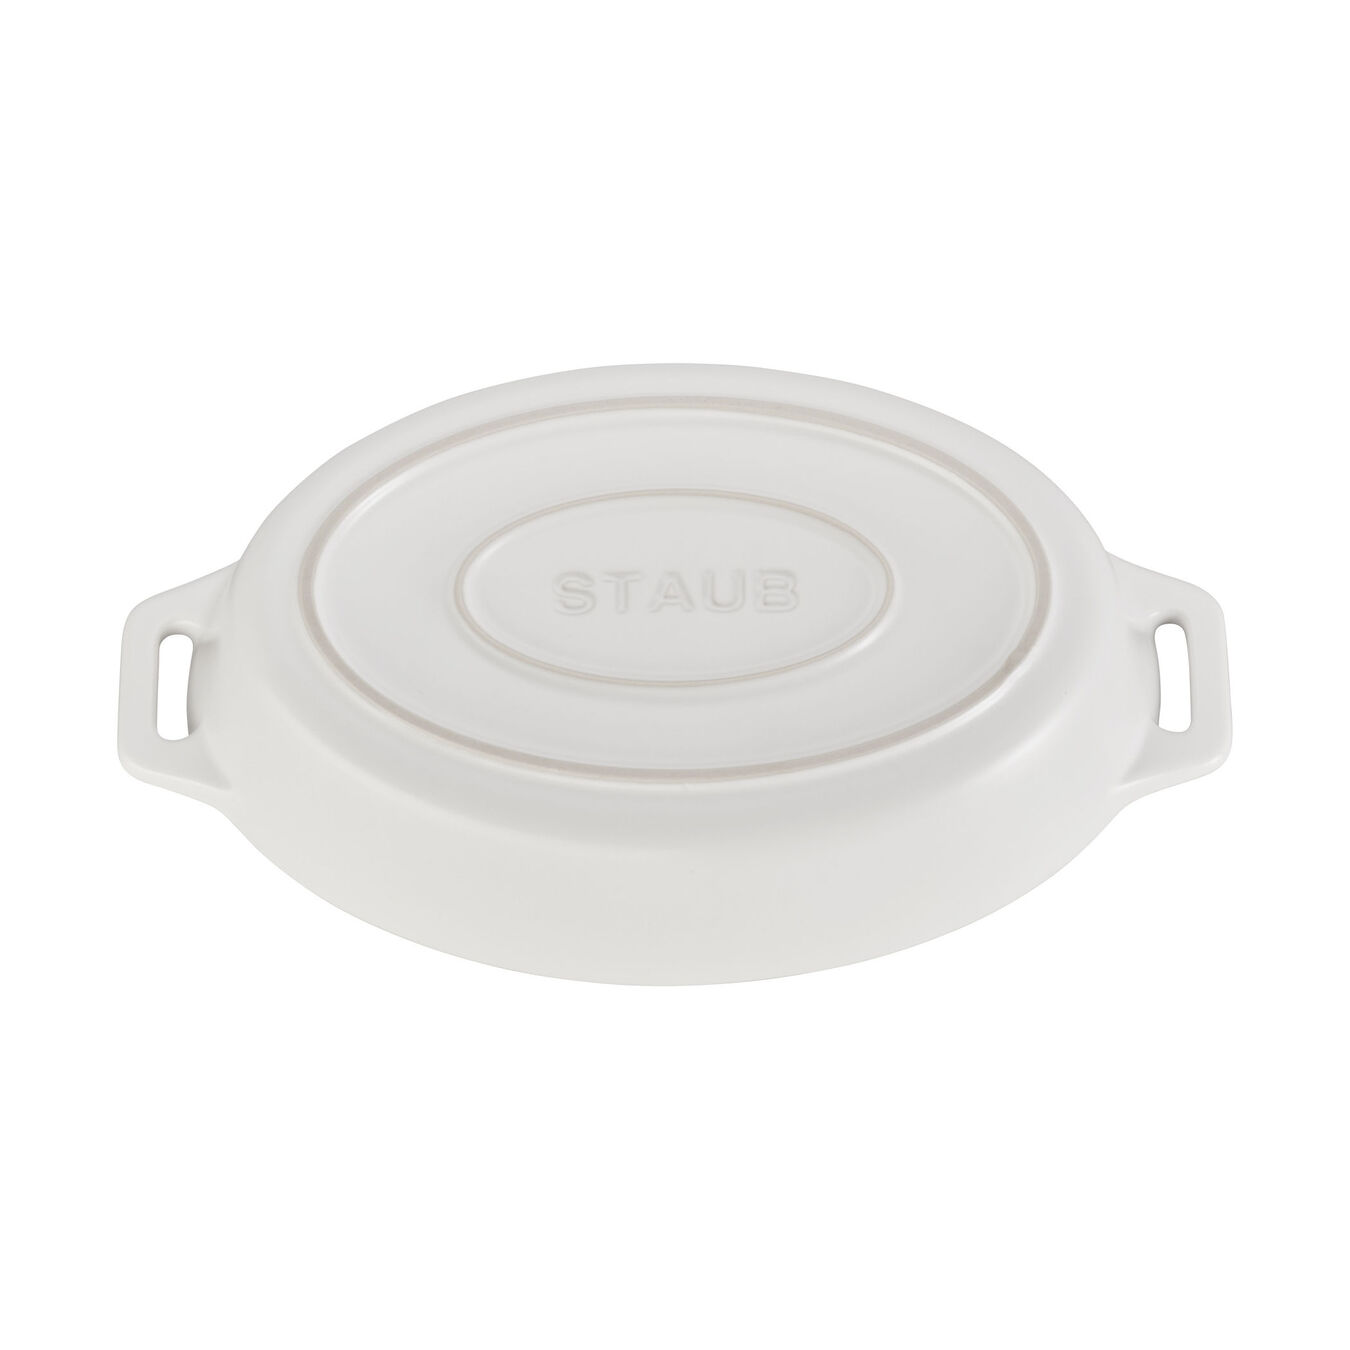 Ceramic oval Oven dish, matte-white,,large 3